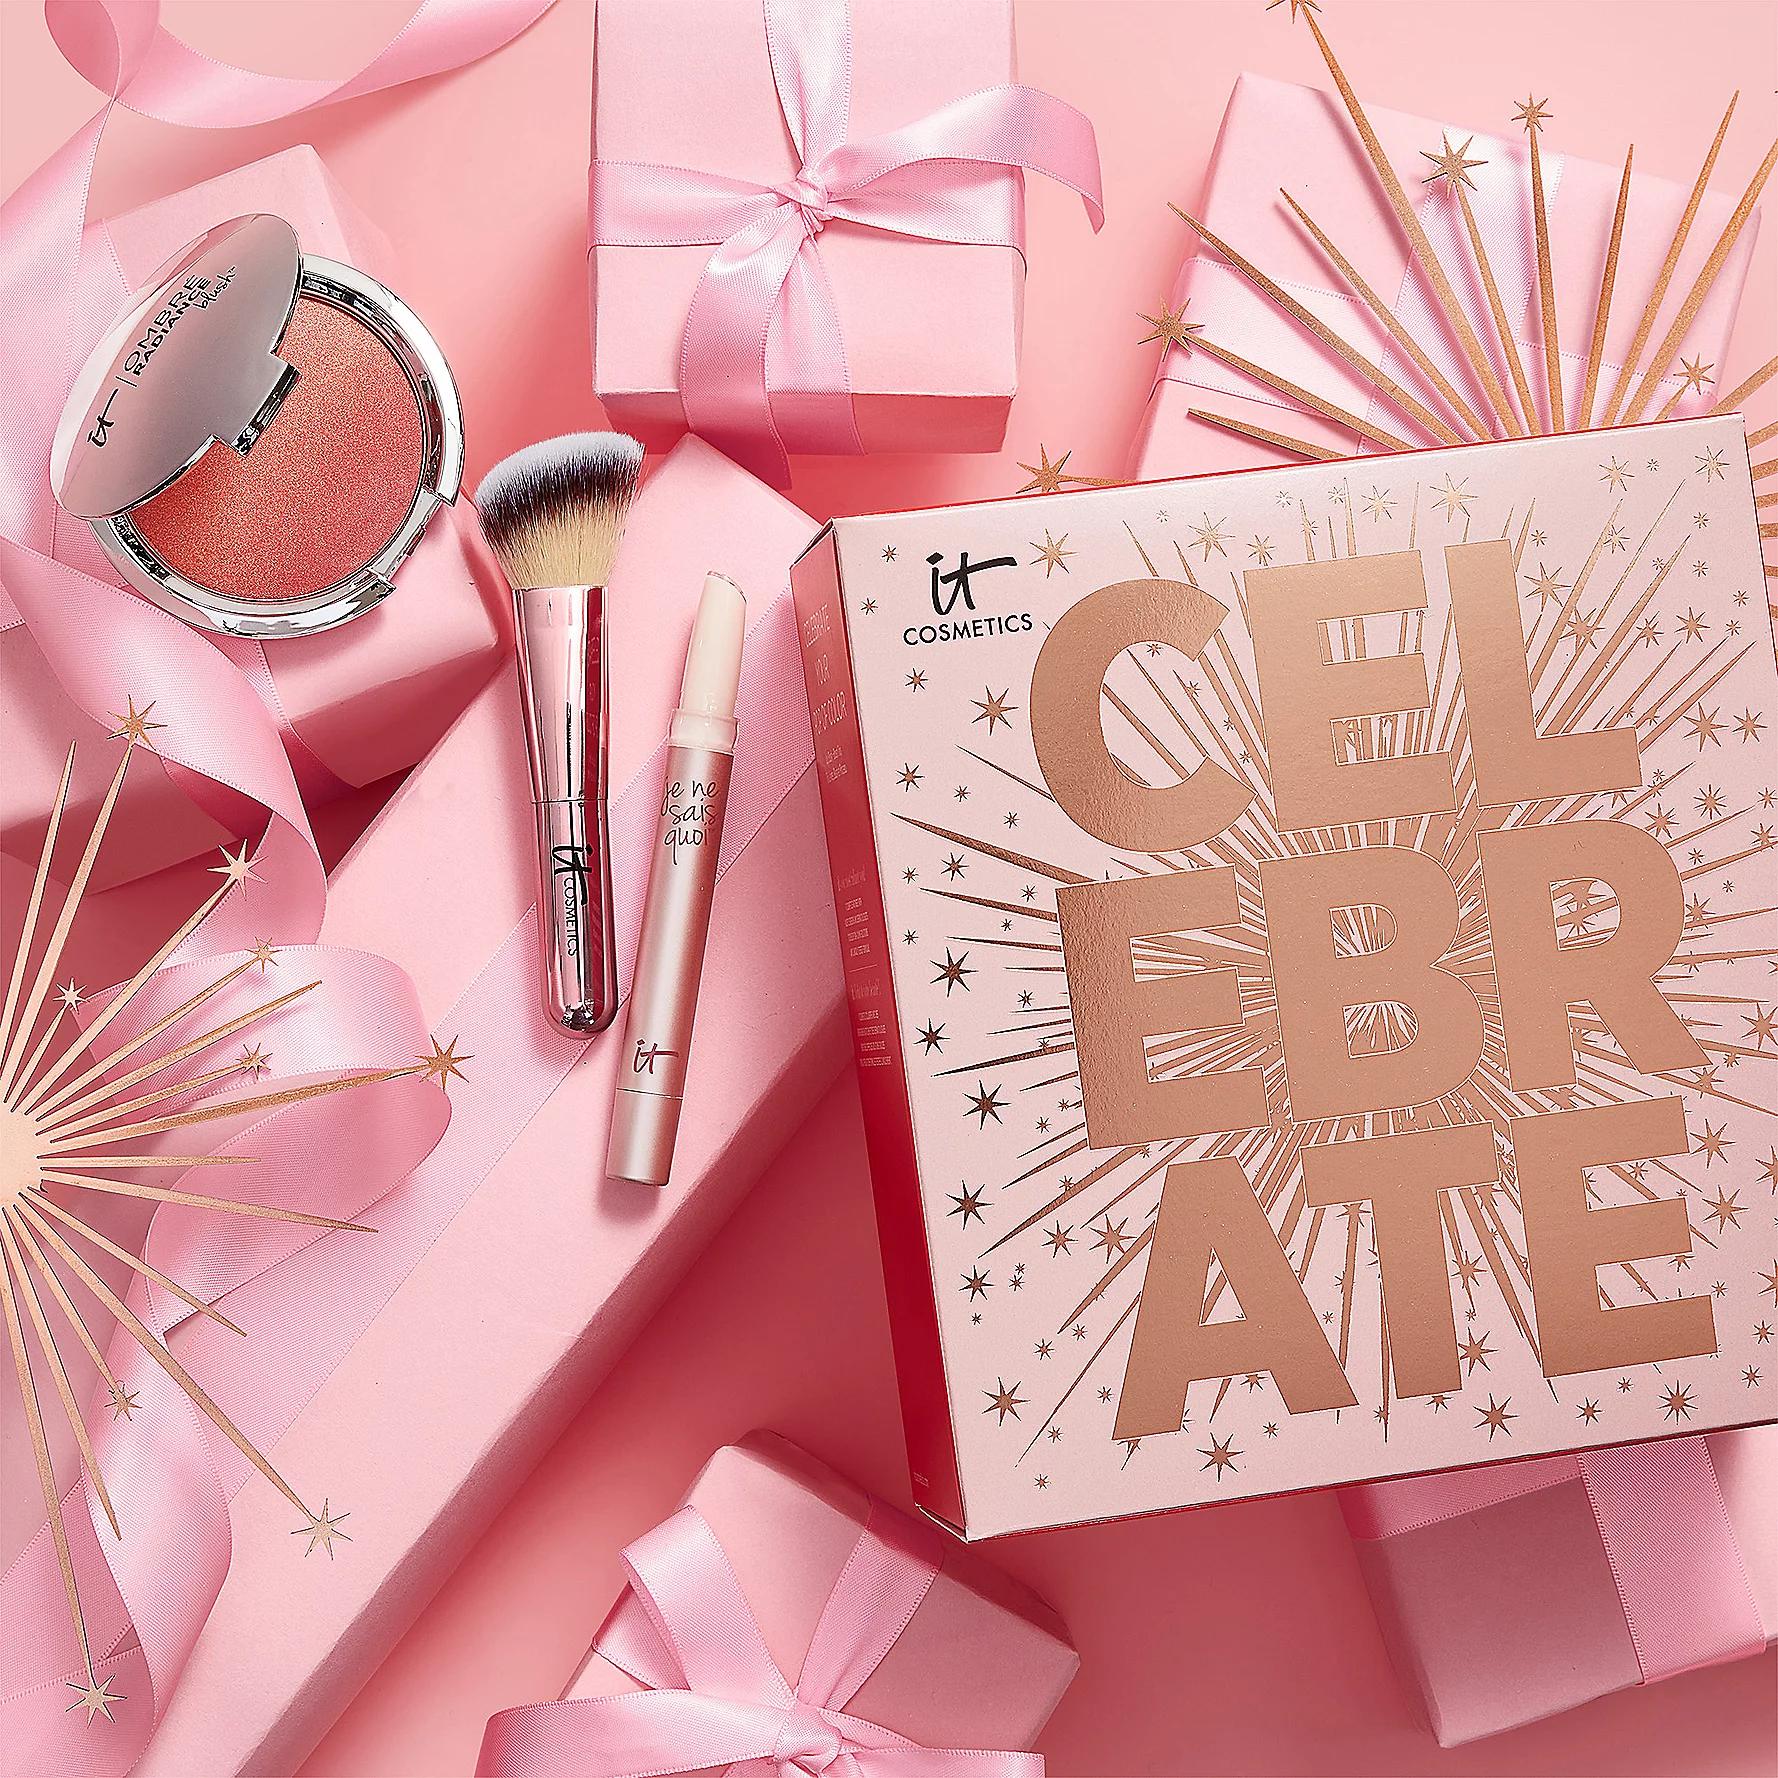 IT Cosmetics Celebrate Your Pop of Color Set